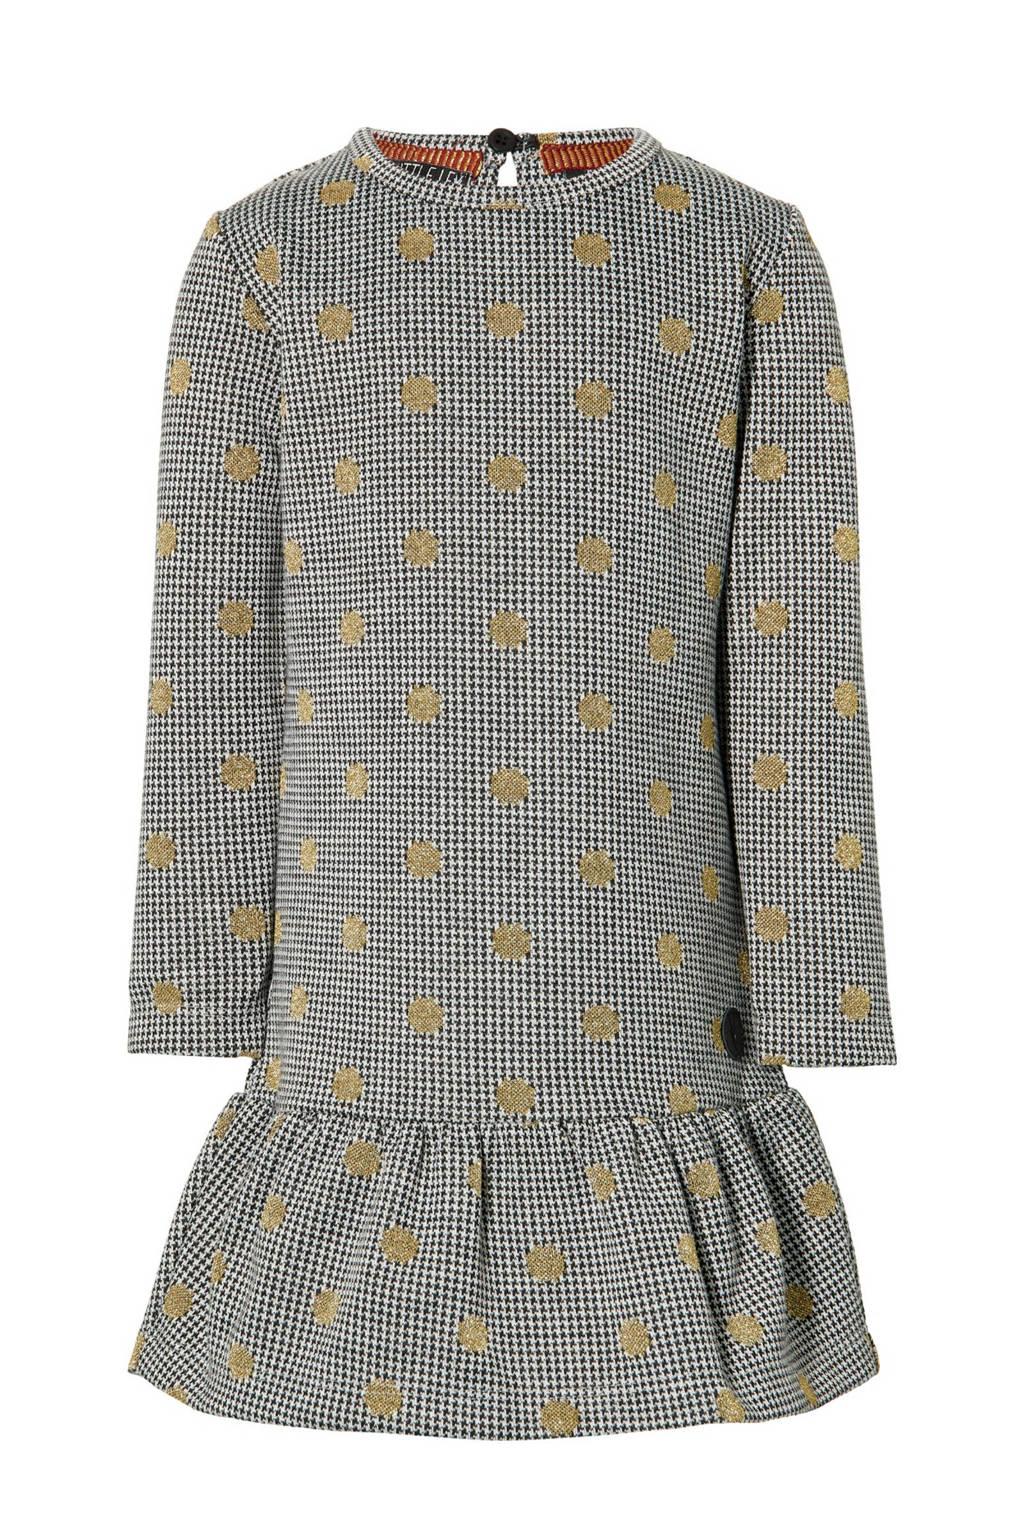 LEVV Little jurk Lea met pied-de-poule zwart/wit/goud, Zwart/wit/goud